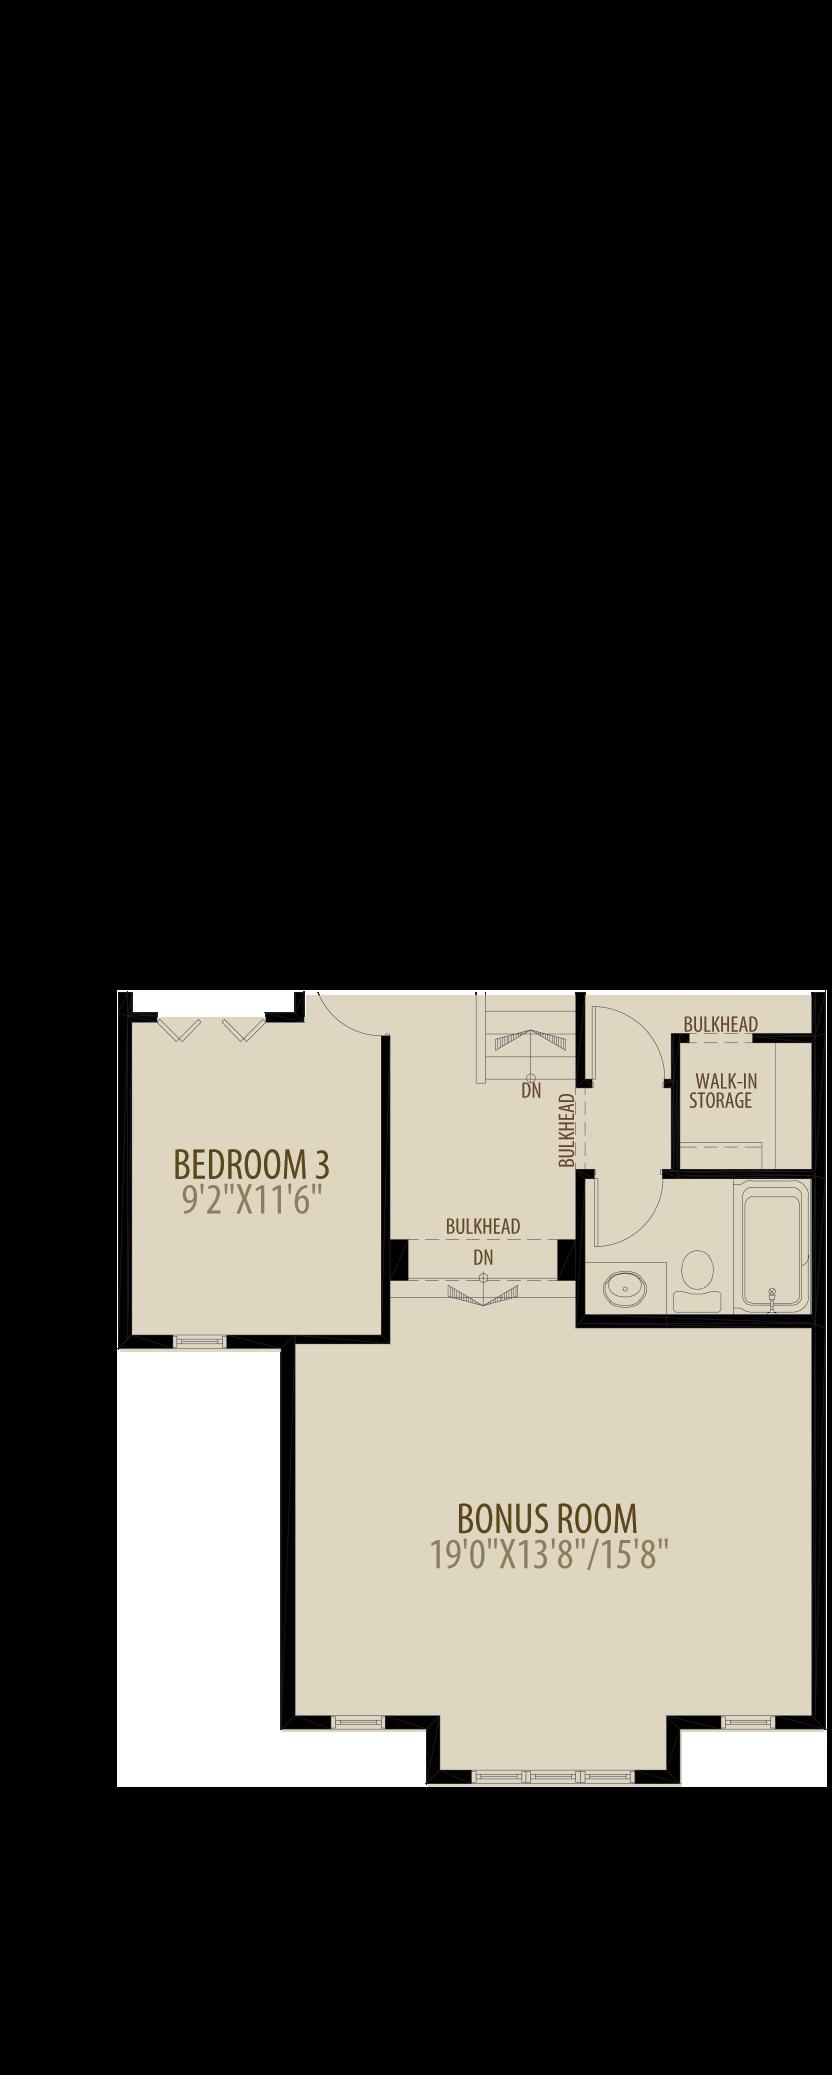 Extended Bonus Room adds 50 sq ft